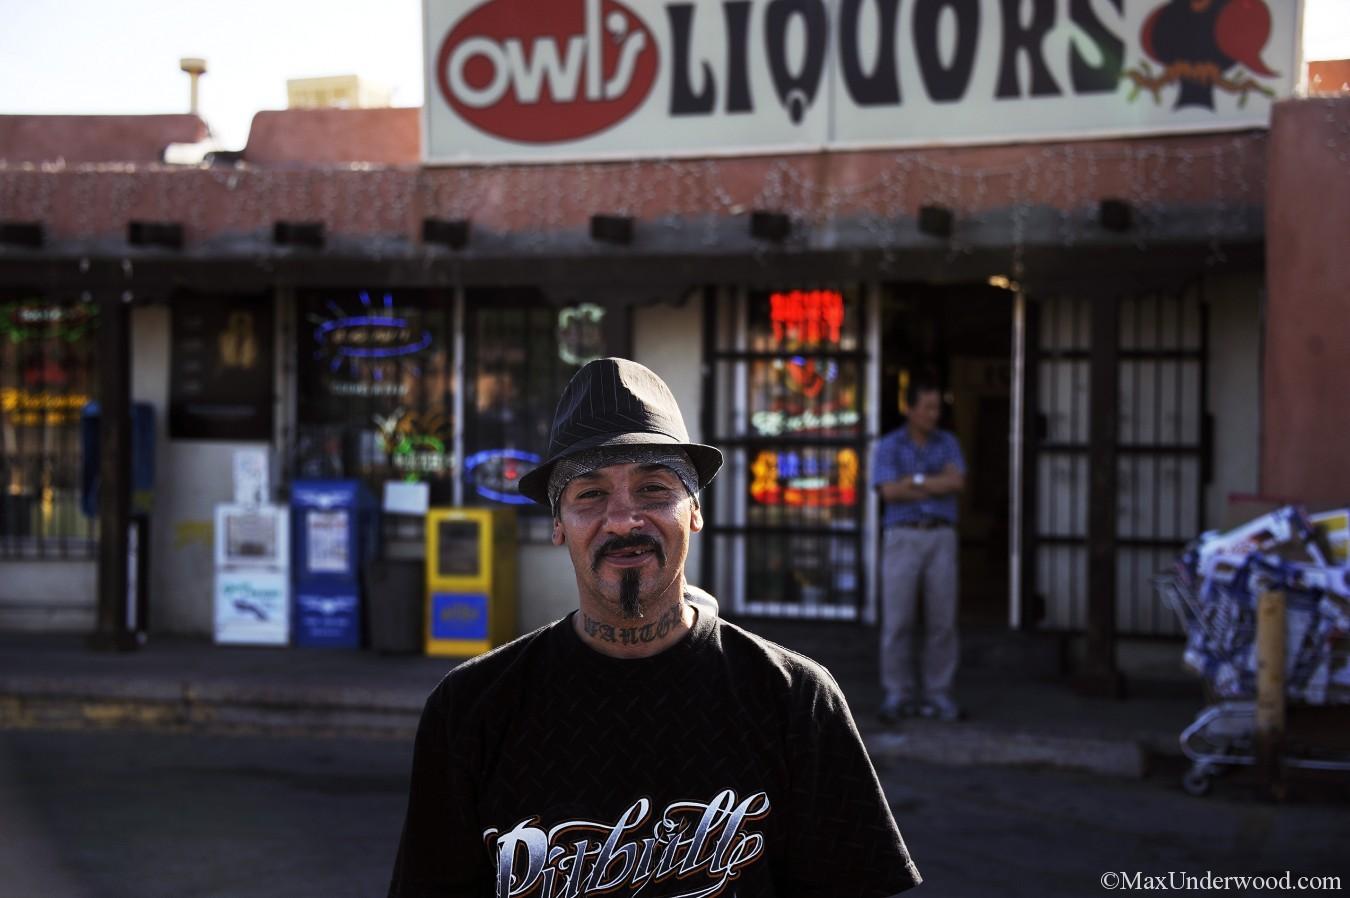 Owl's Liquors portrait, Santa Fe, NM.